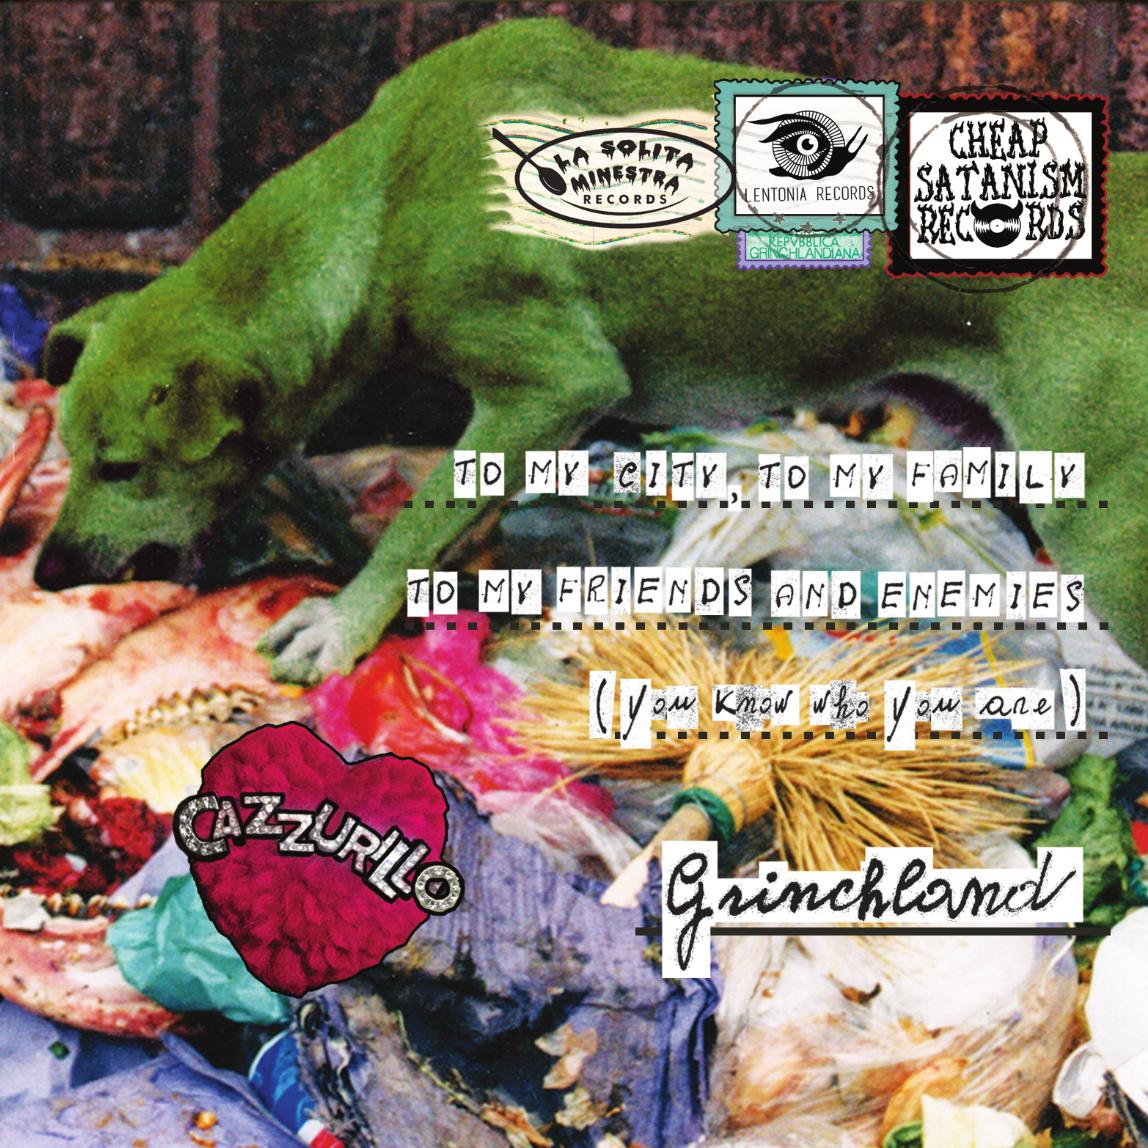 Cat #: CHEAP666/034 Release date: 02/12/2016 Format: CD / Digital Labels: La Solita Minestra / Cheap Satanism Records / Lentonia Records Distribution: Mandaï